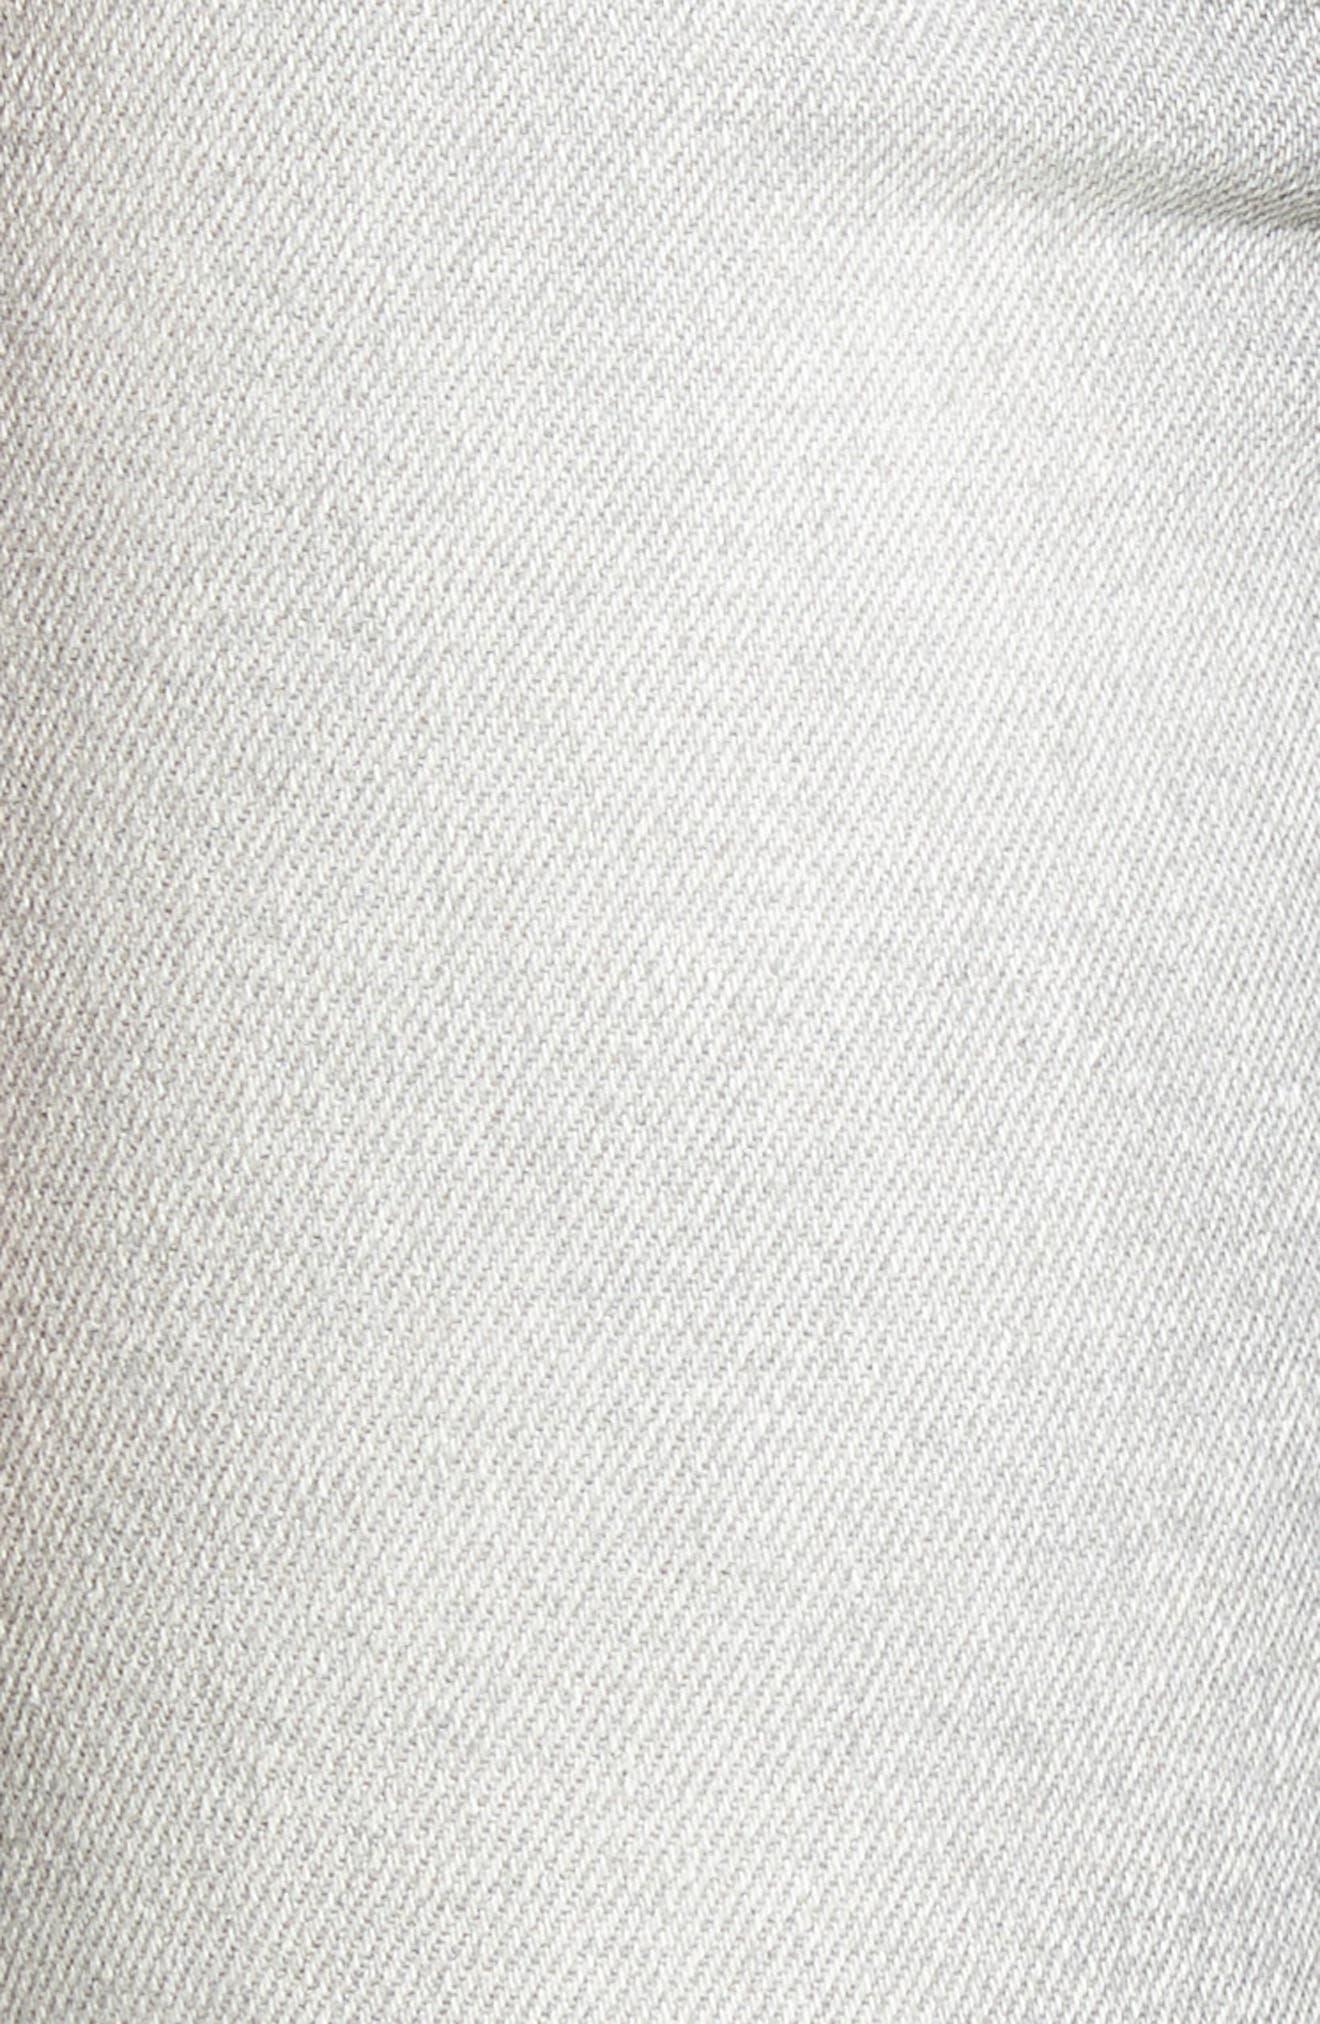 Alternate Image 6  - Current/Elliott The Stiletto High Waist Ankle Skinny Jeans (Astor)